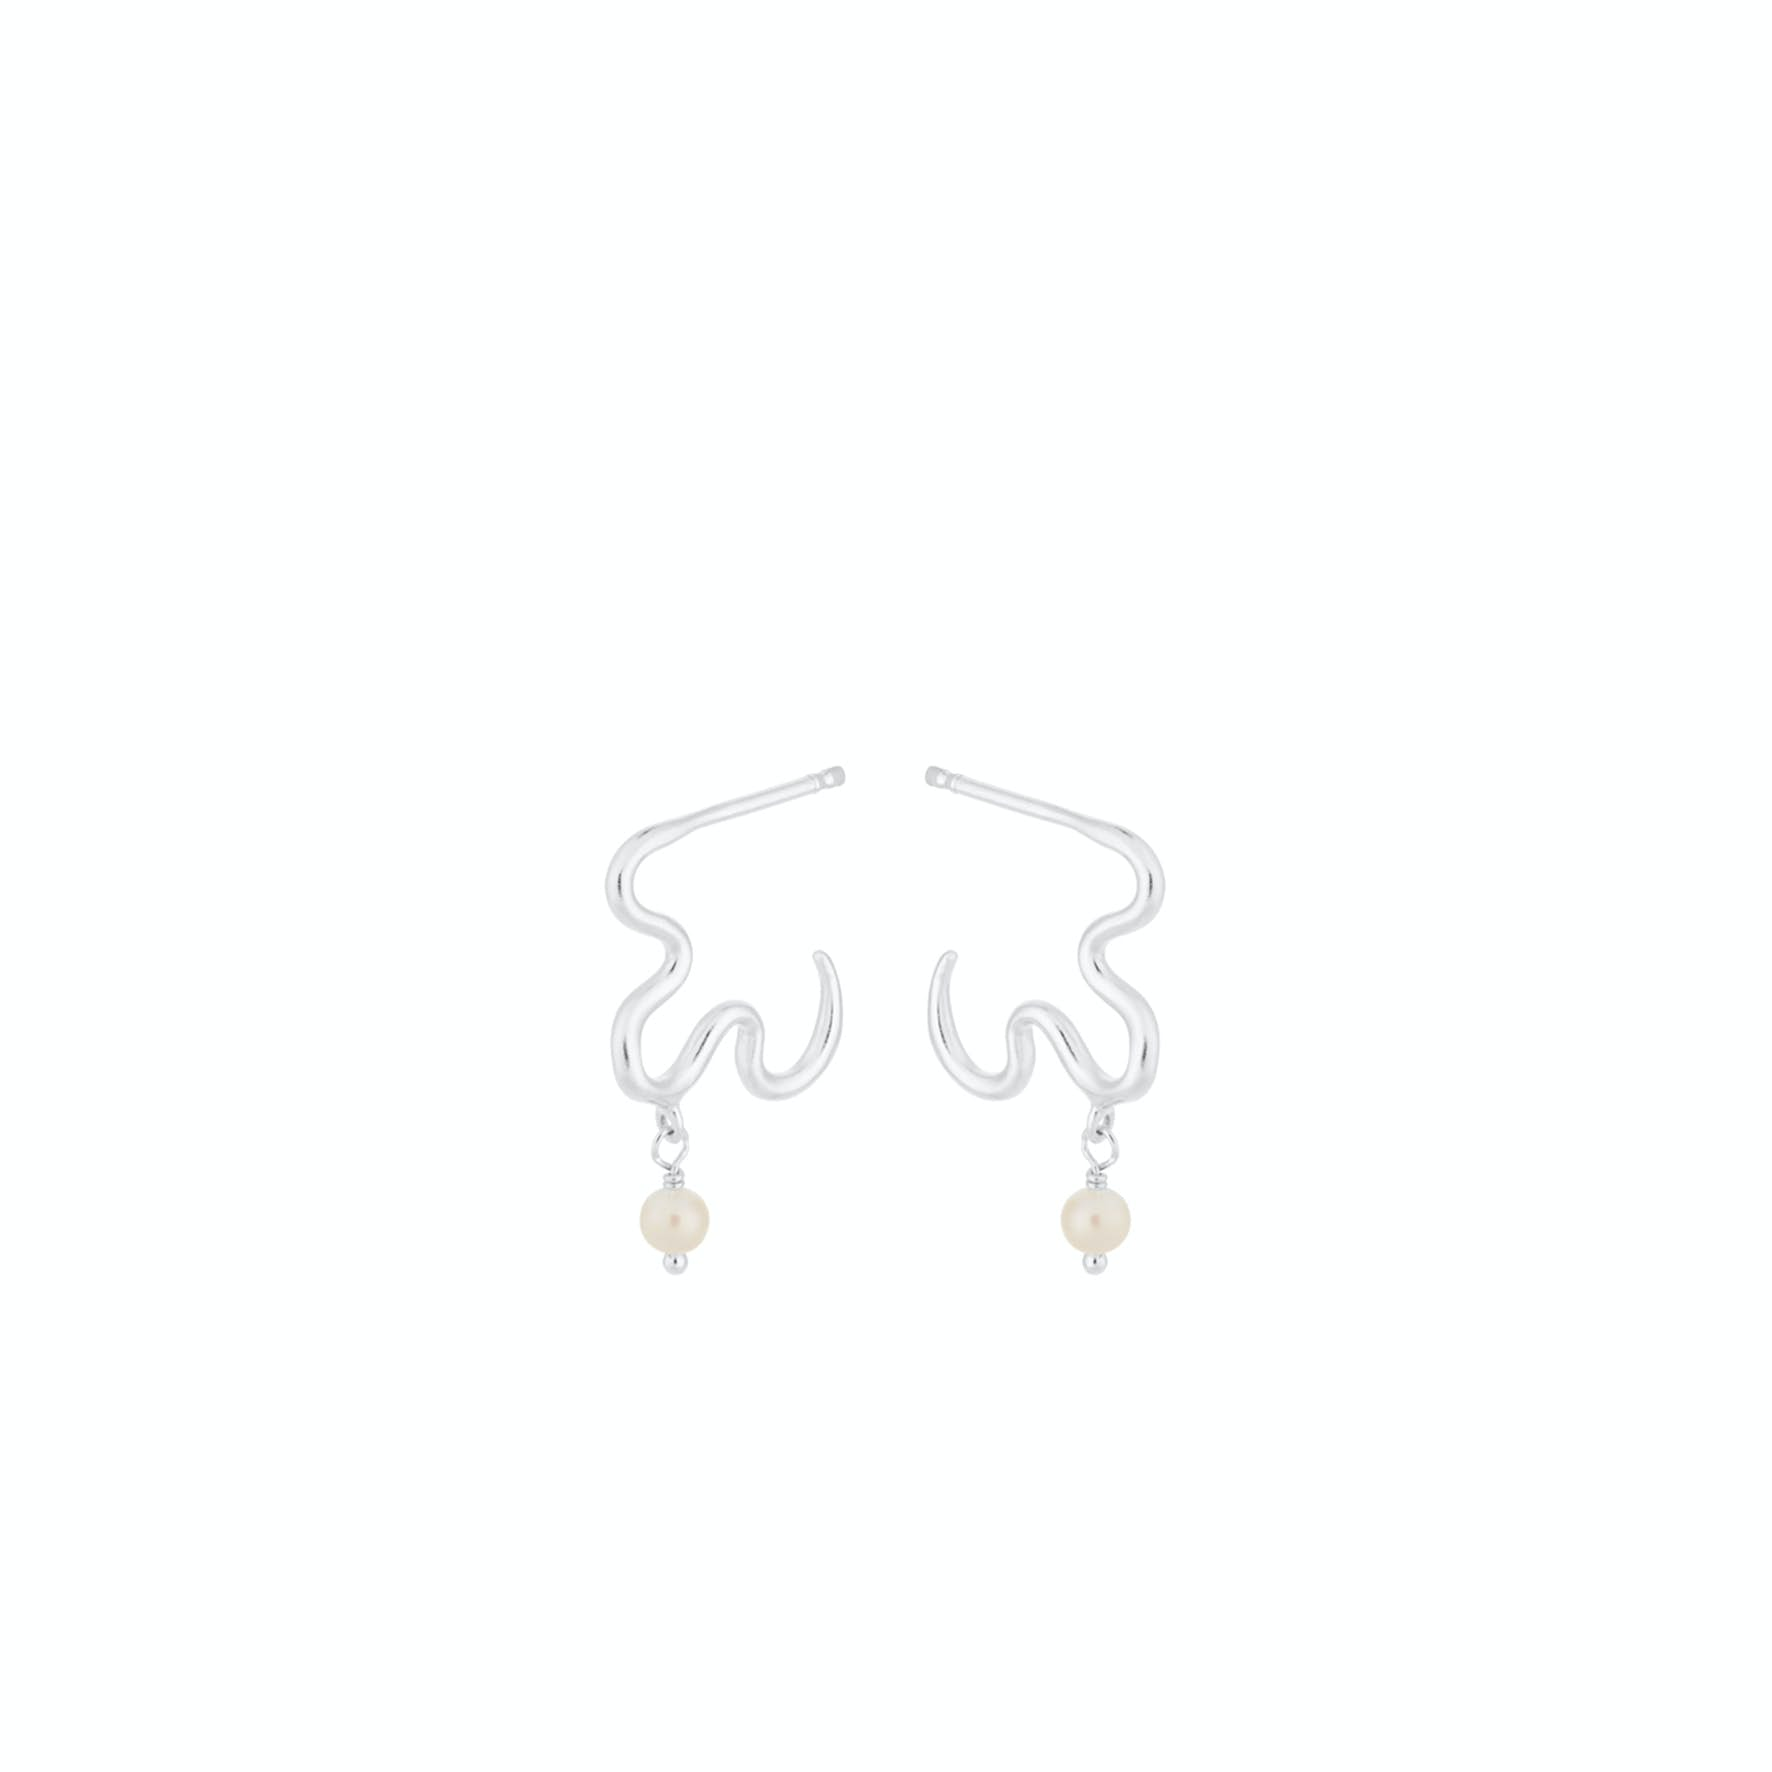 Ocean Dream Earrings von Pernille Corydon in Silber Sterling 925|Freshwater Pearl